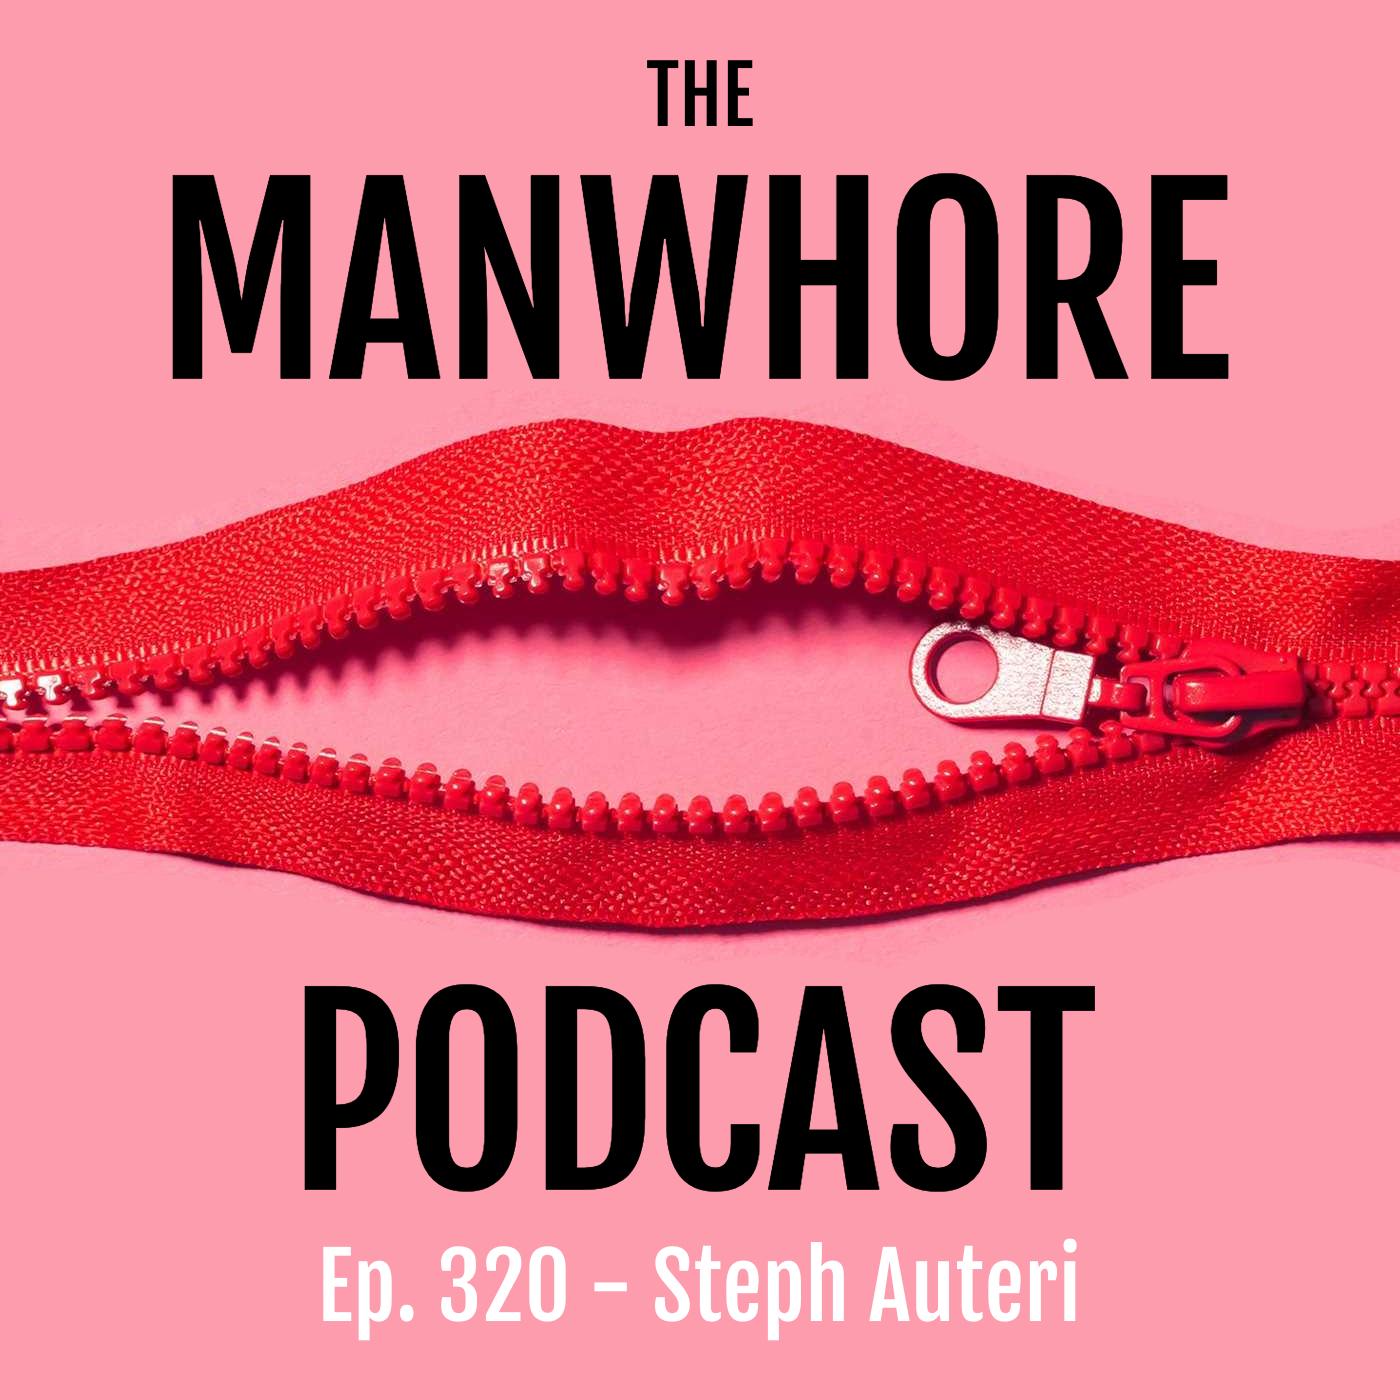 The Manwhore Podcast: A Sex-Positive Quest - Ep. 320: Sex-Positive Parenting with Steph Auteri